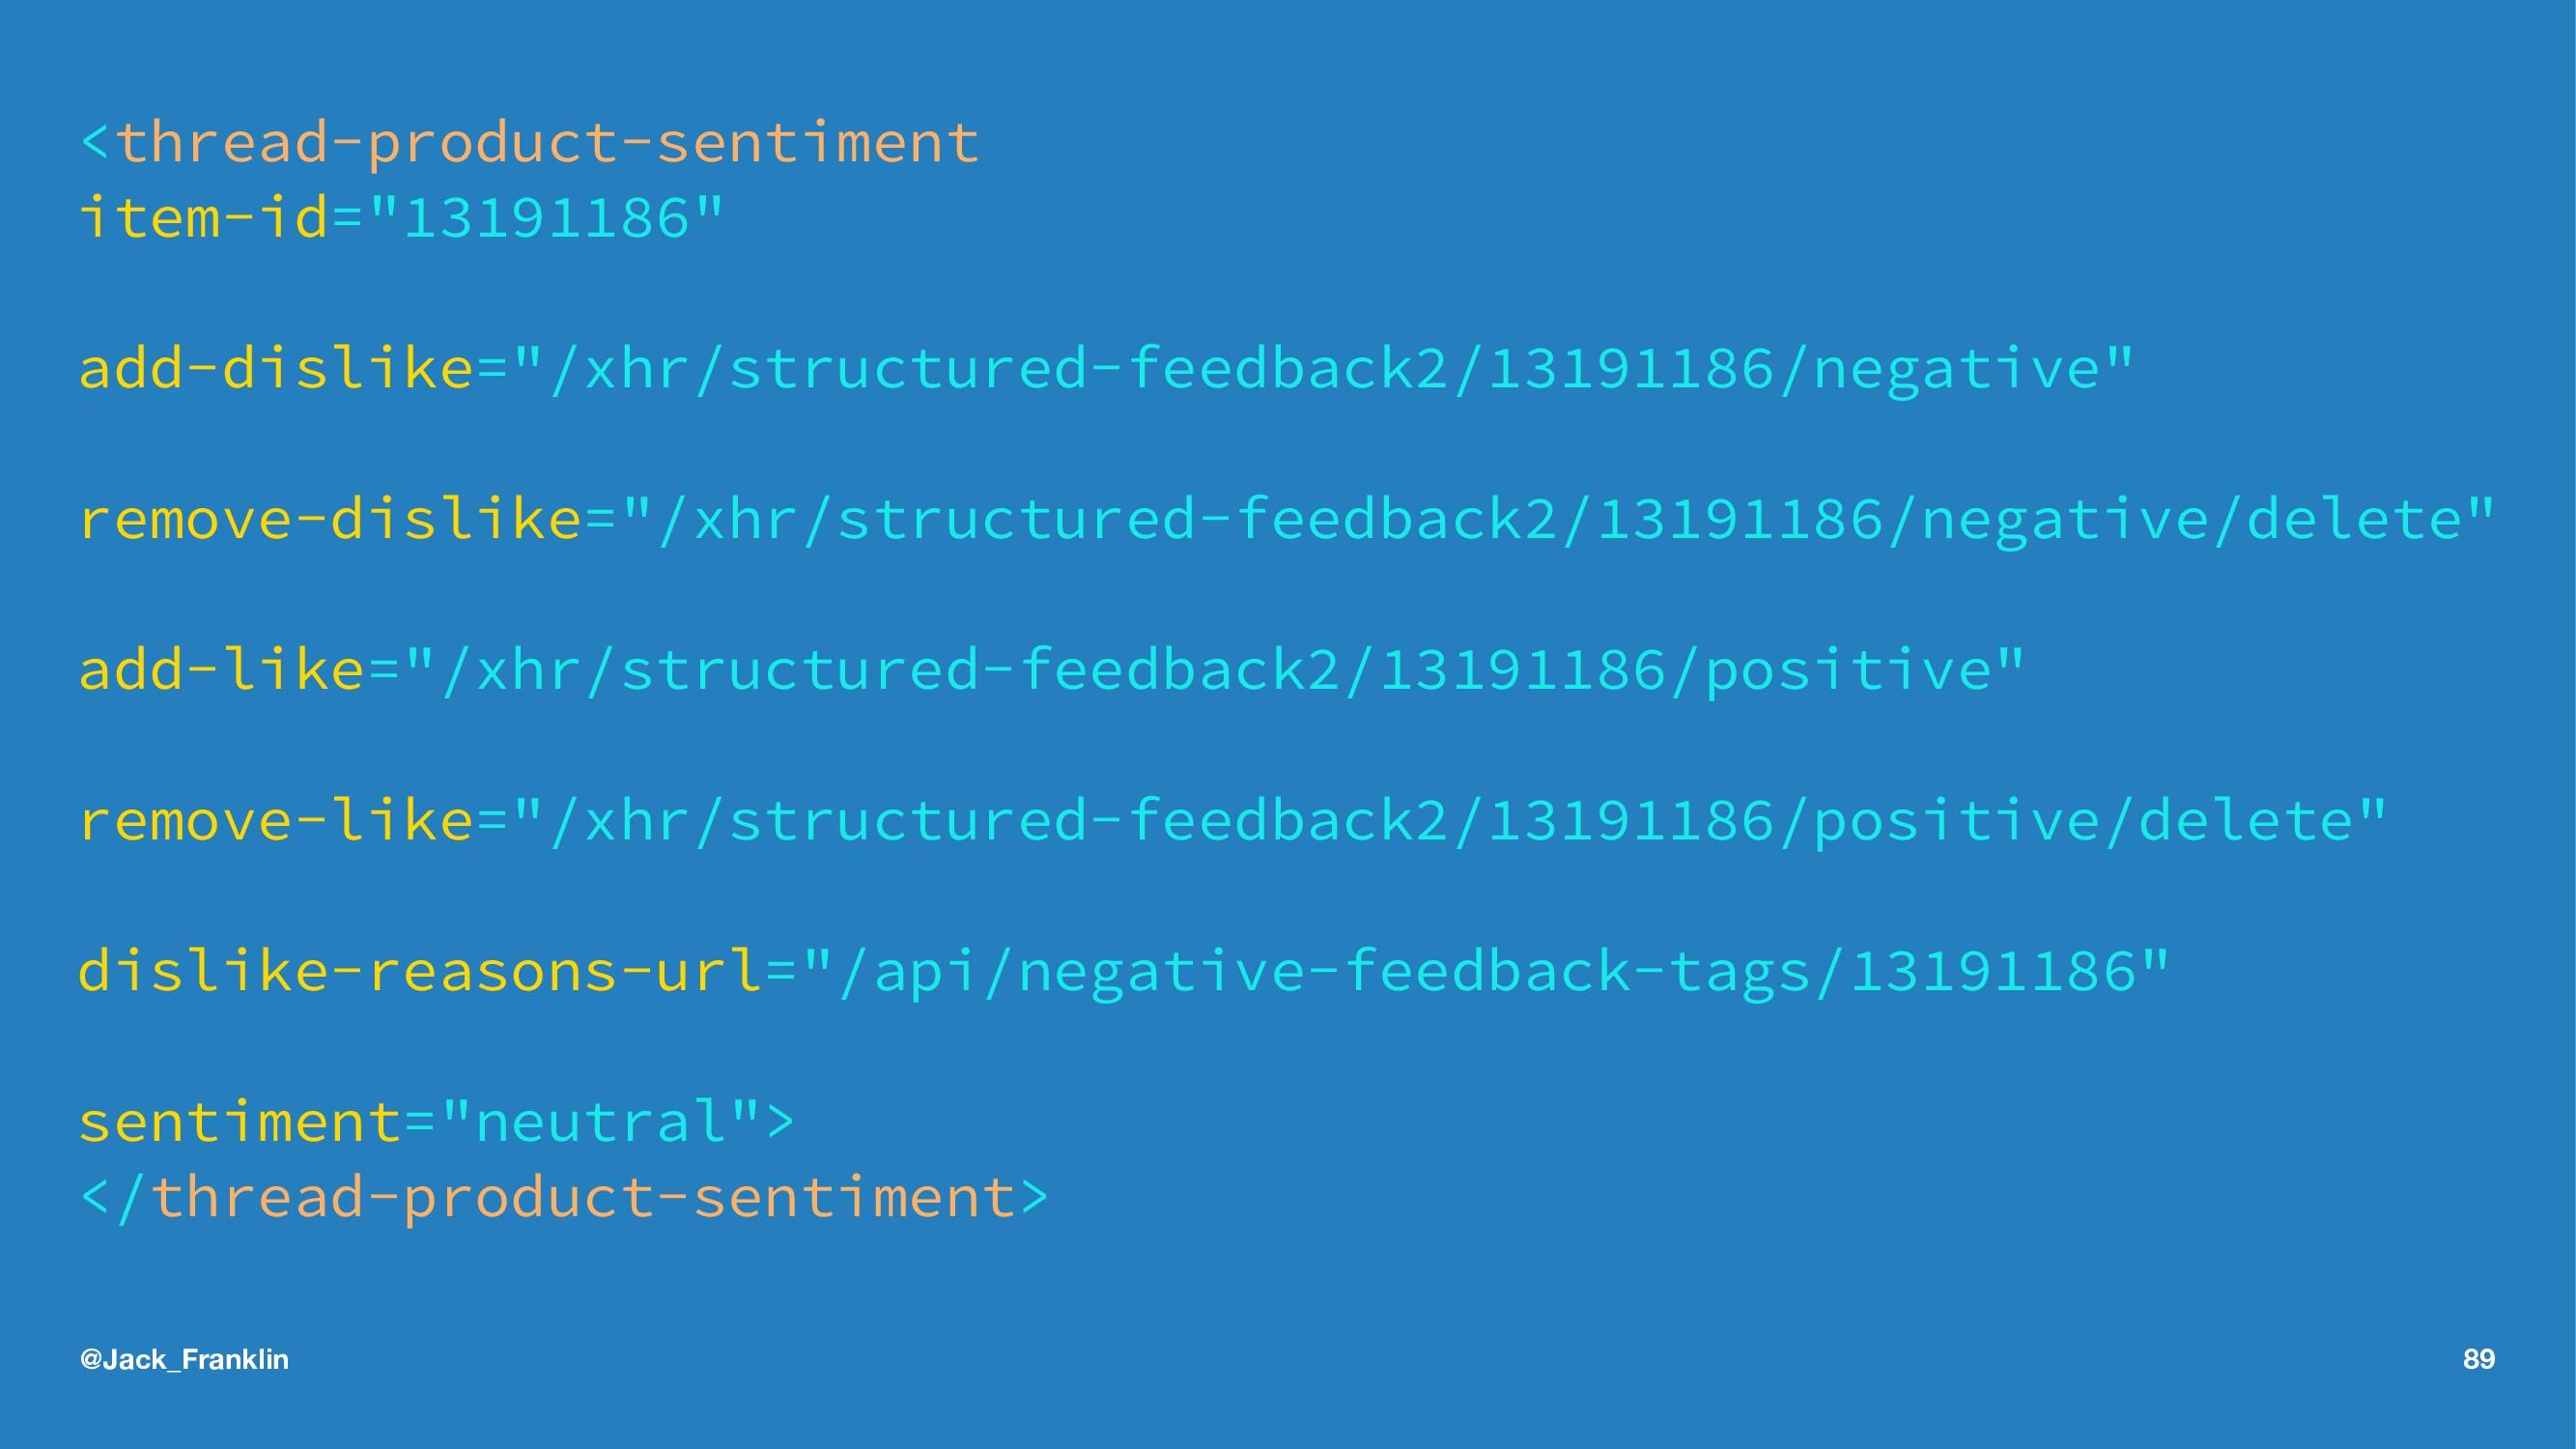 "<thread-product-sentiment item-id=""13191186"" ad..."